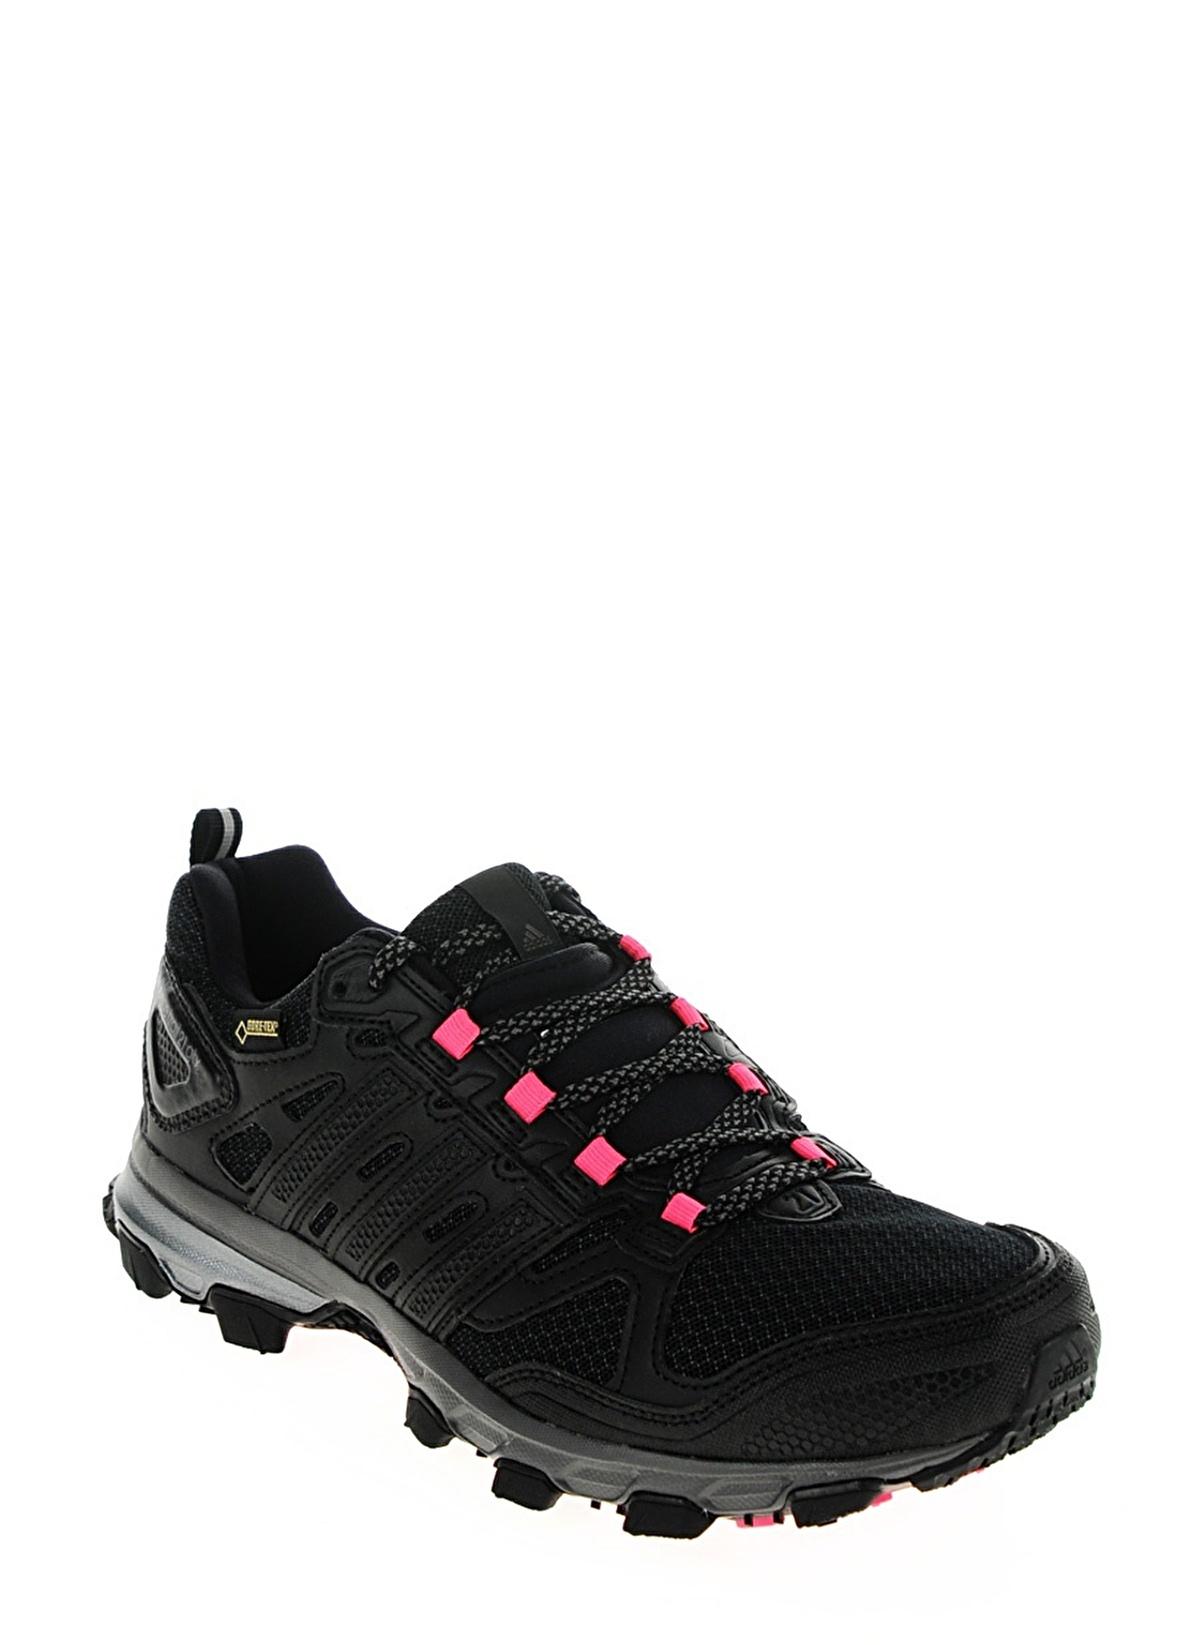 100% authentic 71d79 90ea5 adidas Response Trail Siyah ...